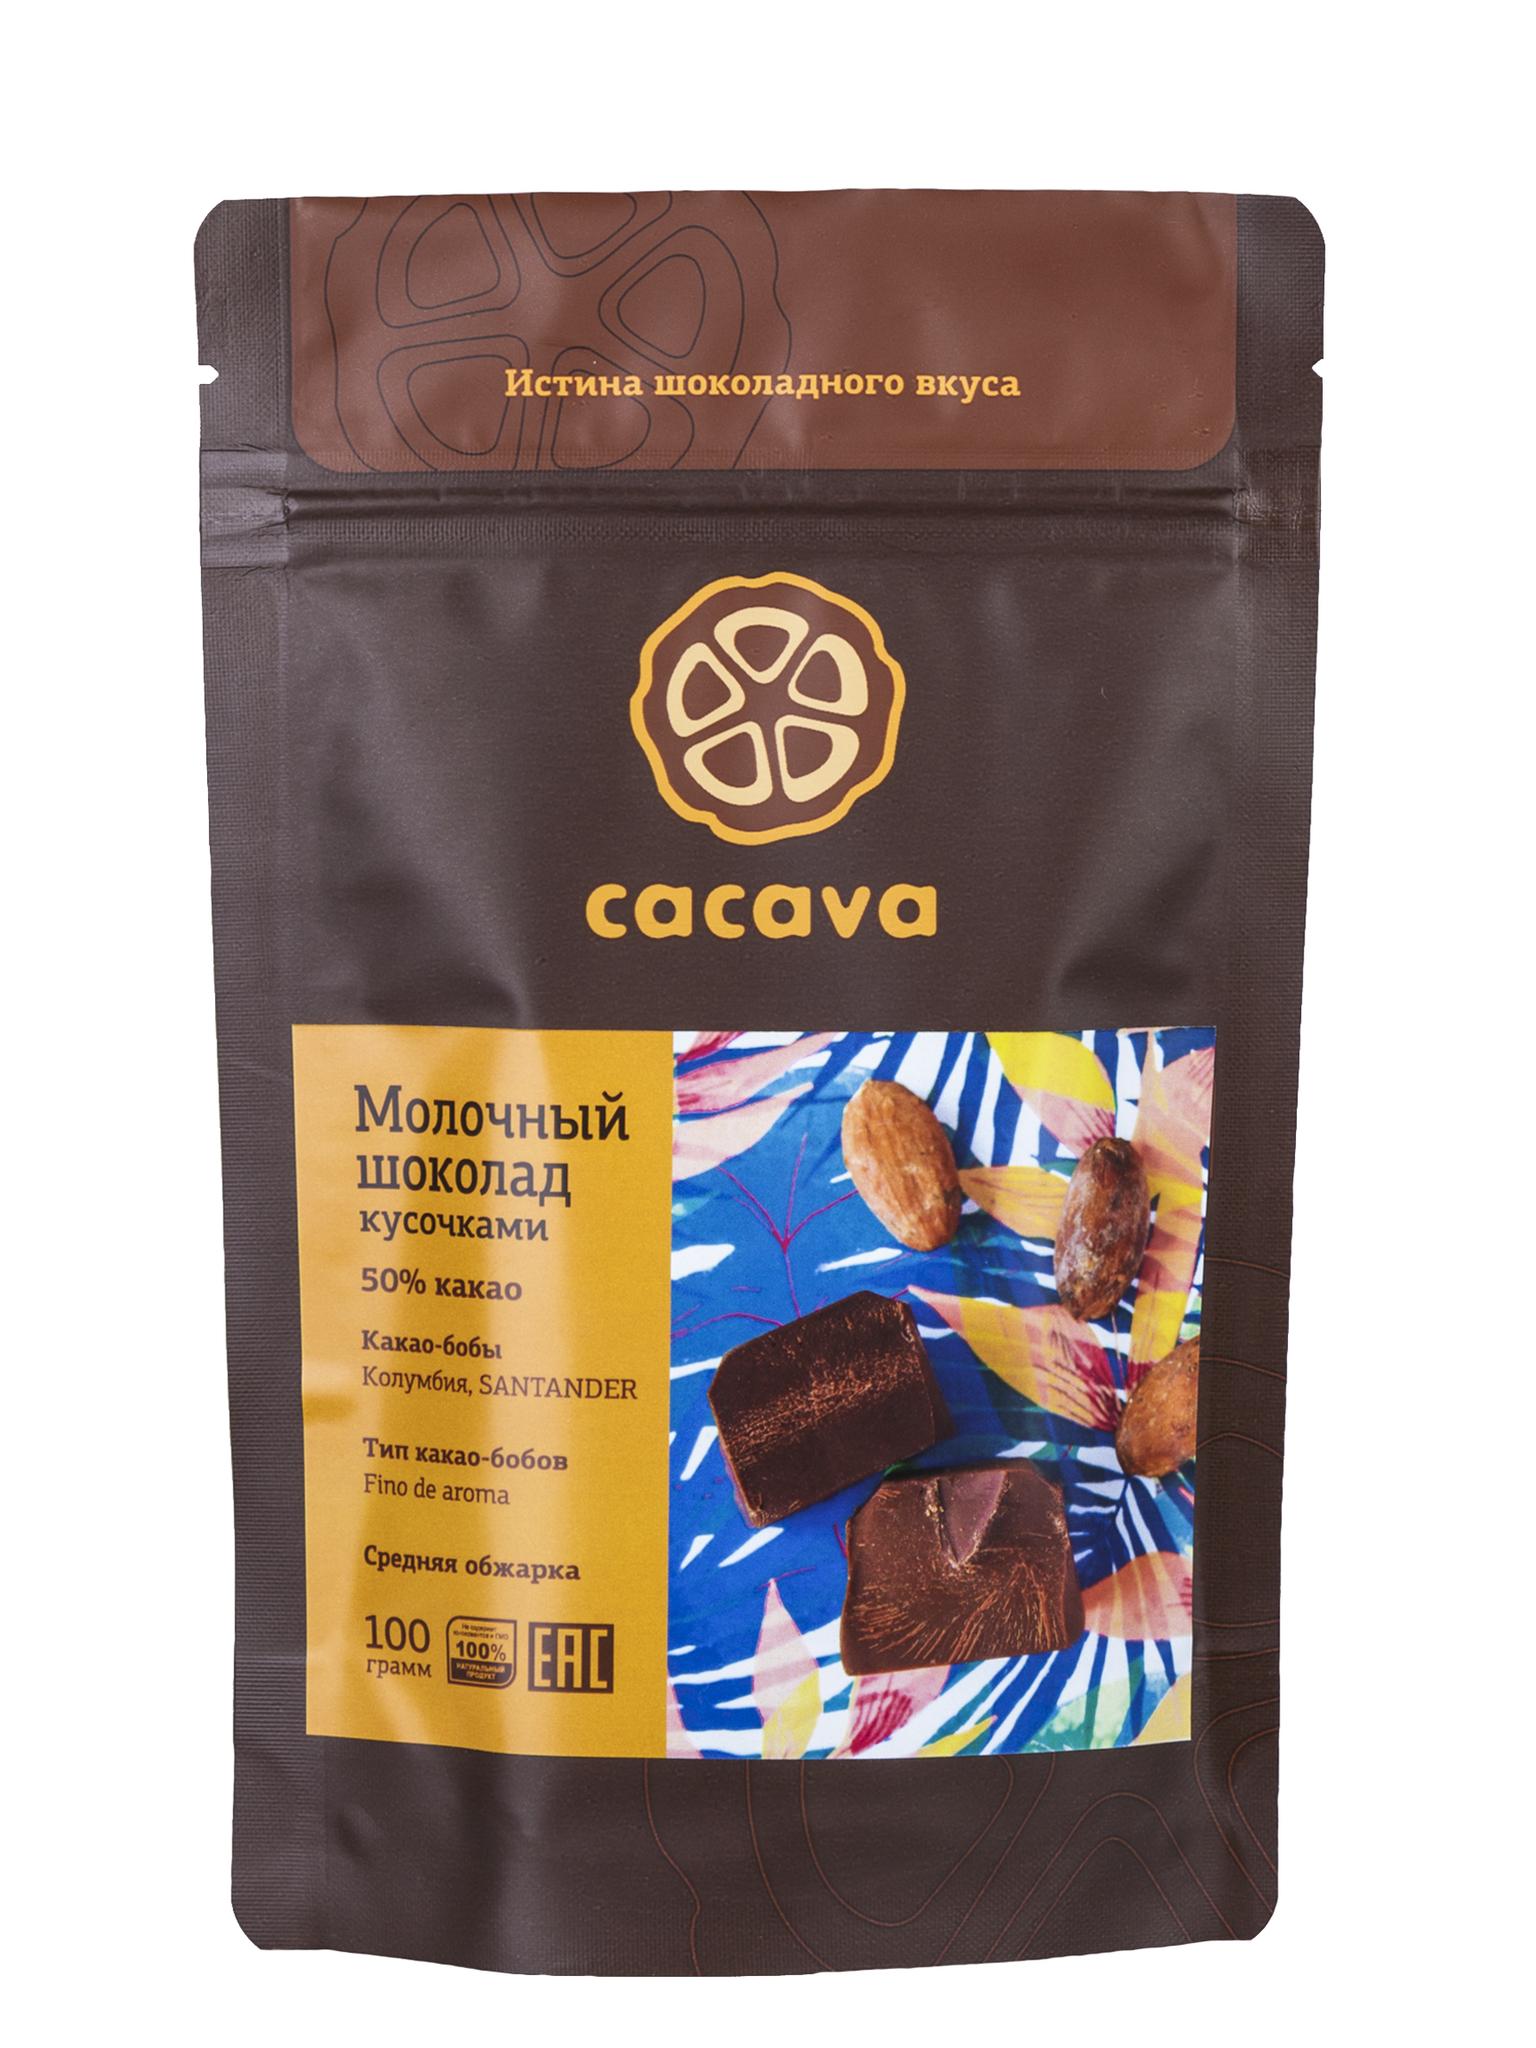 Молочный шоколад 50 % какао (Колумбия), упаковка 100 грамм